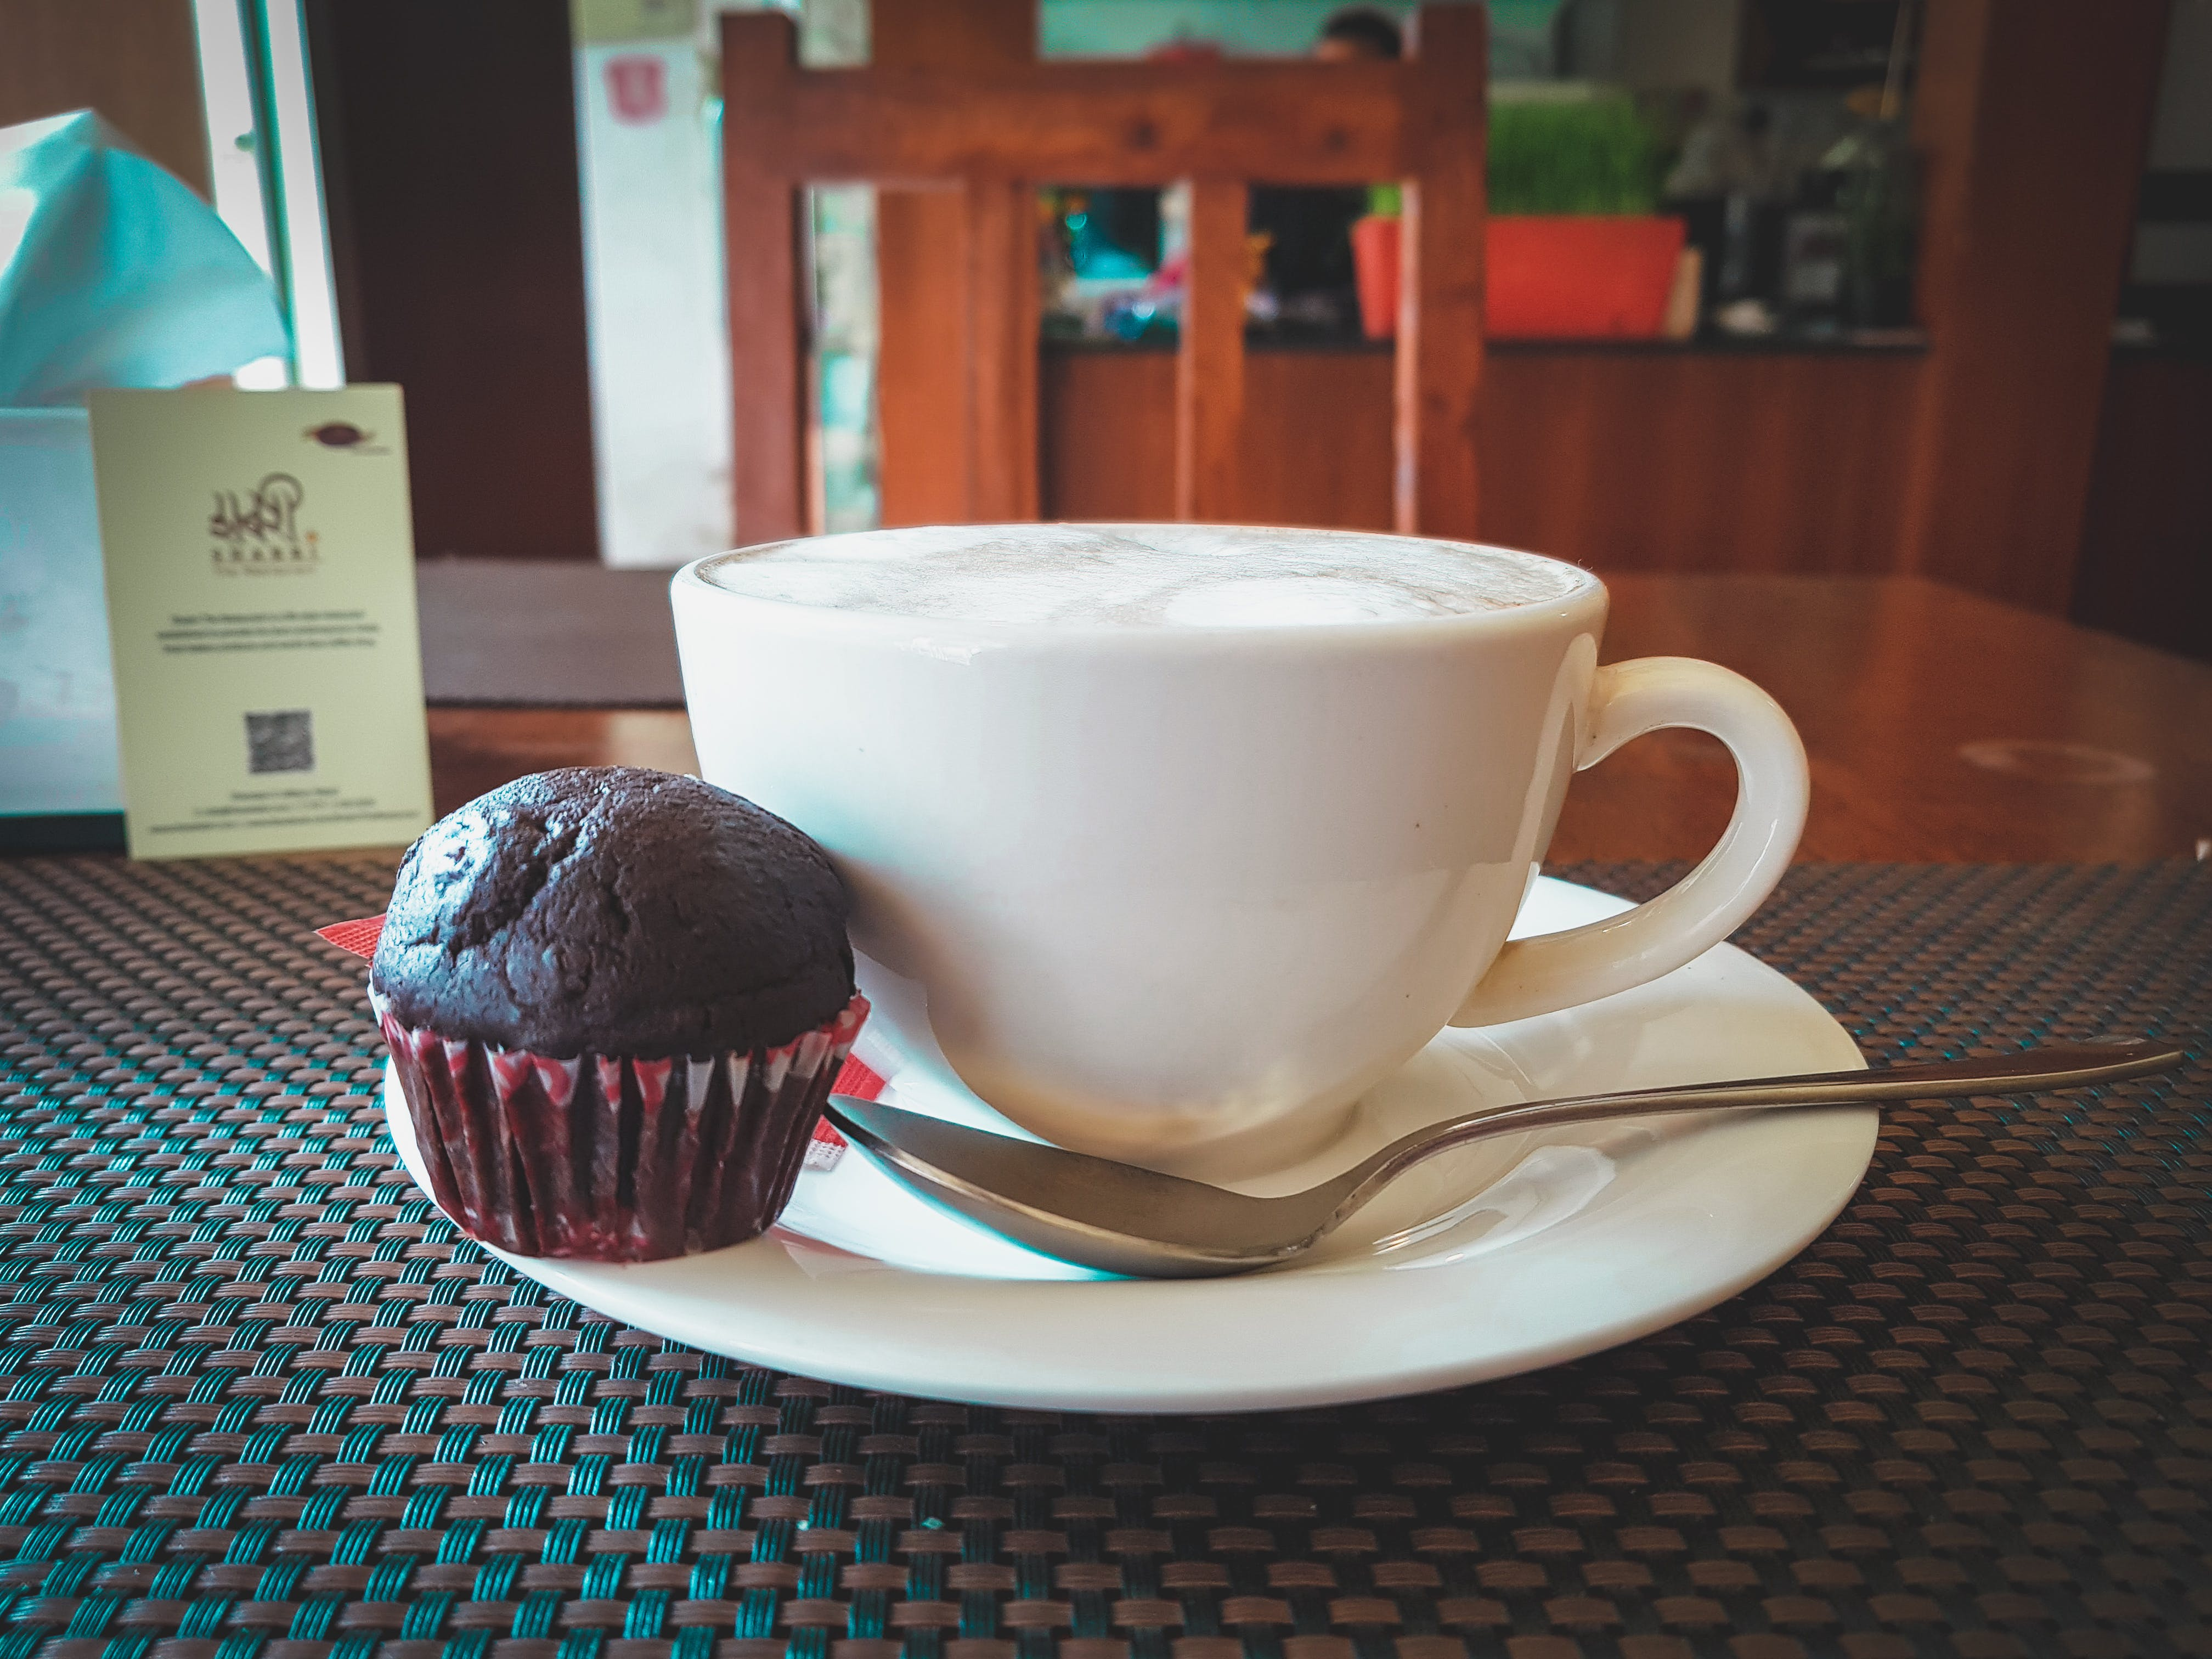 Free stock photo of bar cafe, chocolate cupcakes, coffee, coffee beans